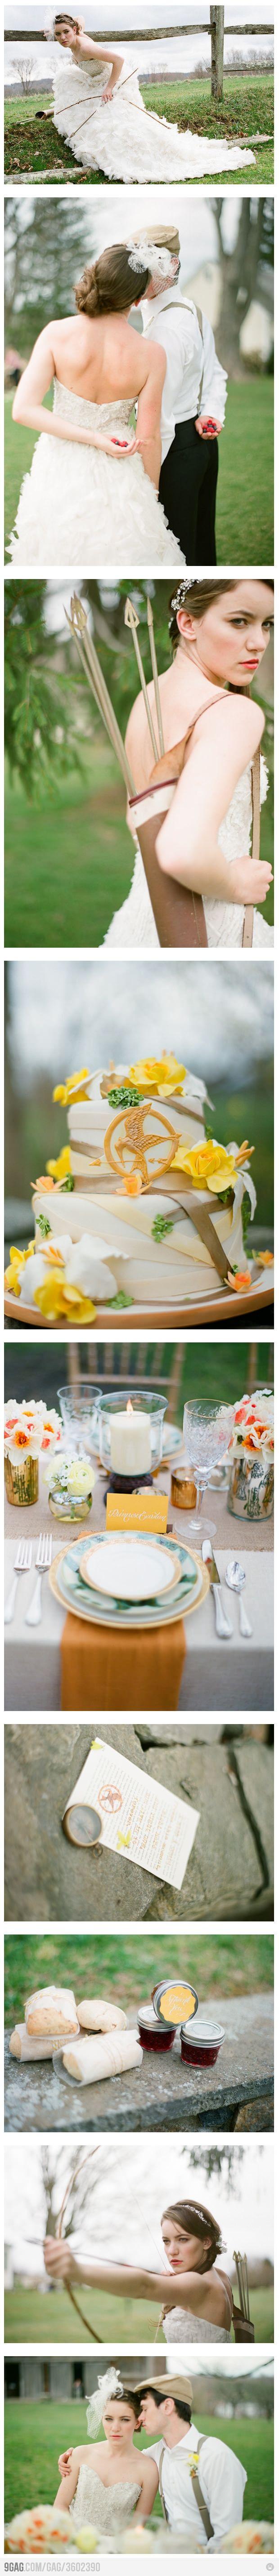 Hunger Games themed wedding photos!!!